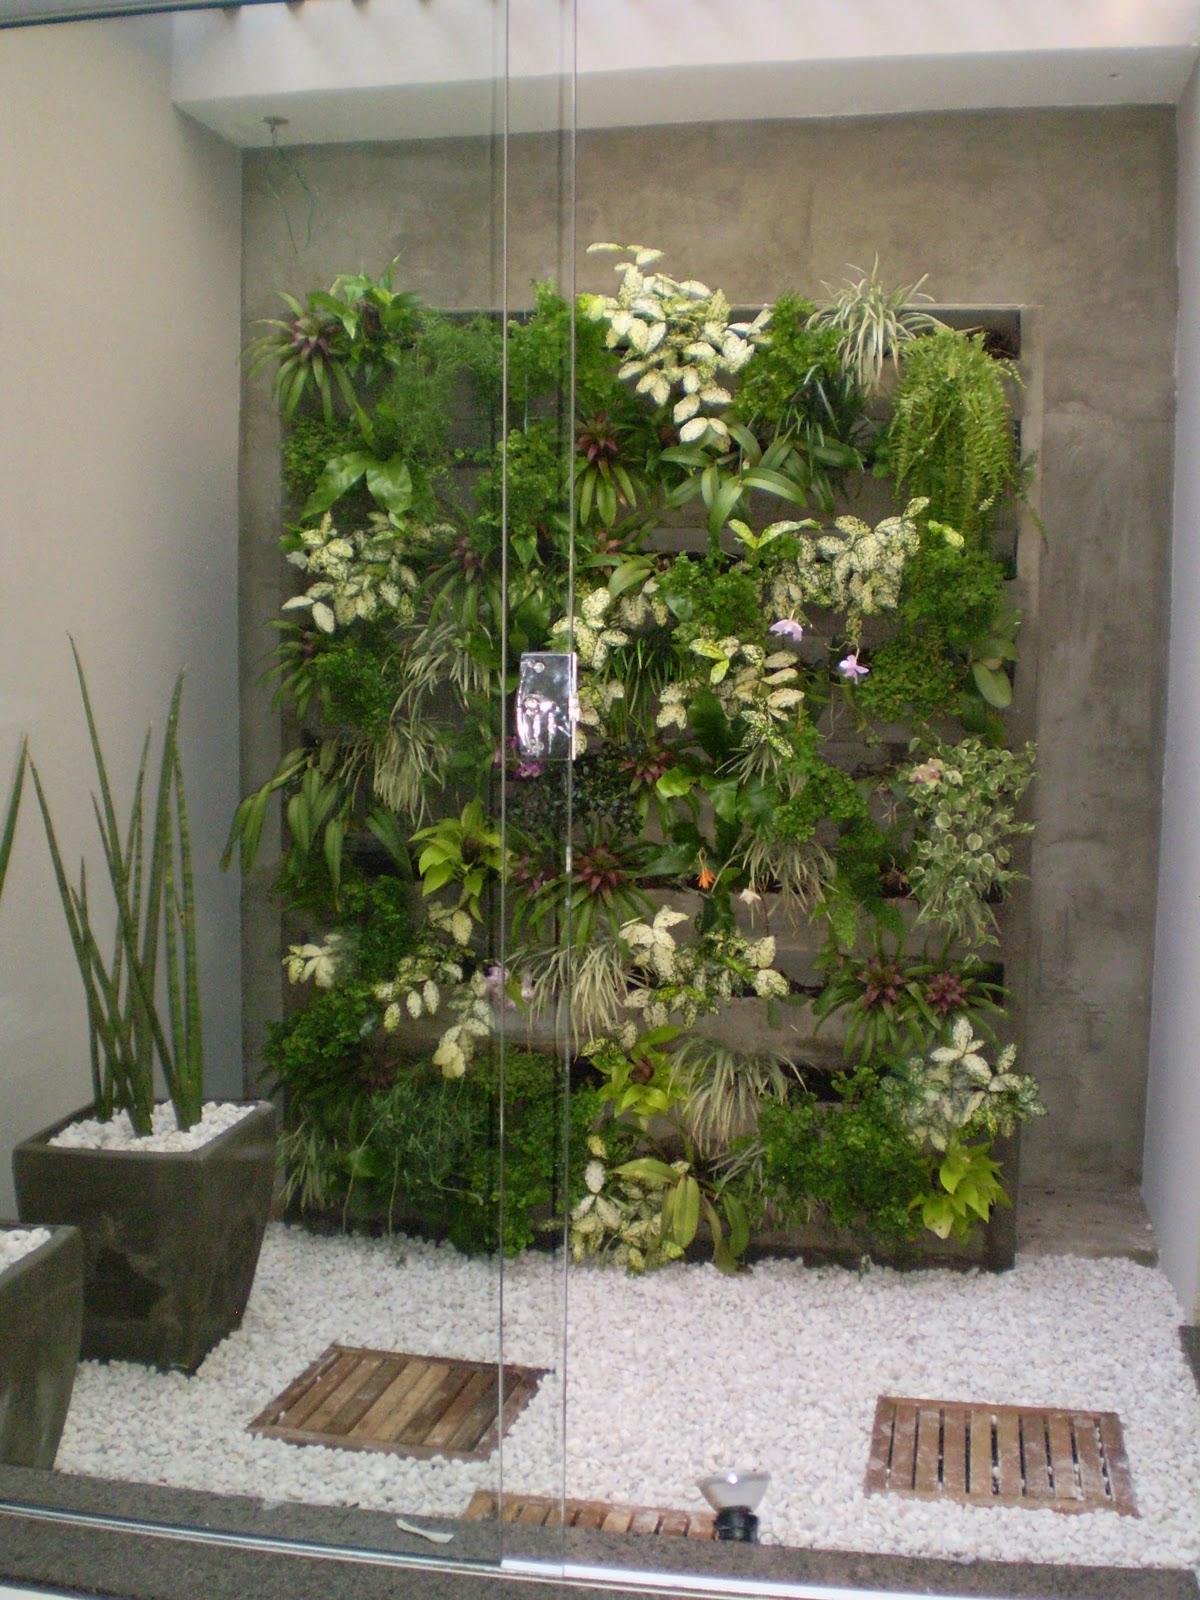 vertical living farming walls garden inside cleanses vertical gardens #4B5E25 1200x1600 Banheiro Com Jardim Vertical